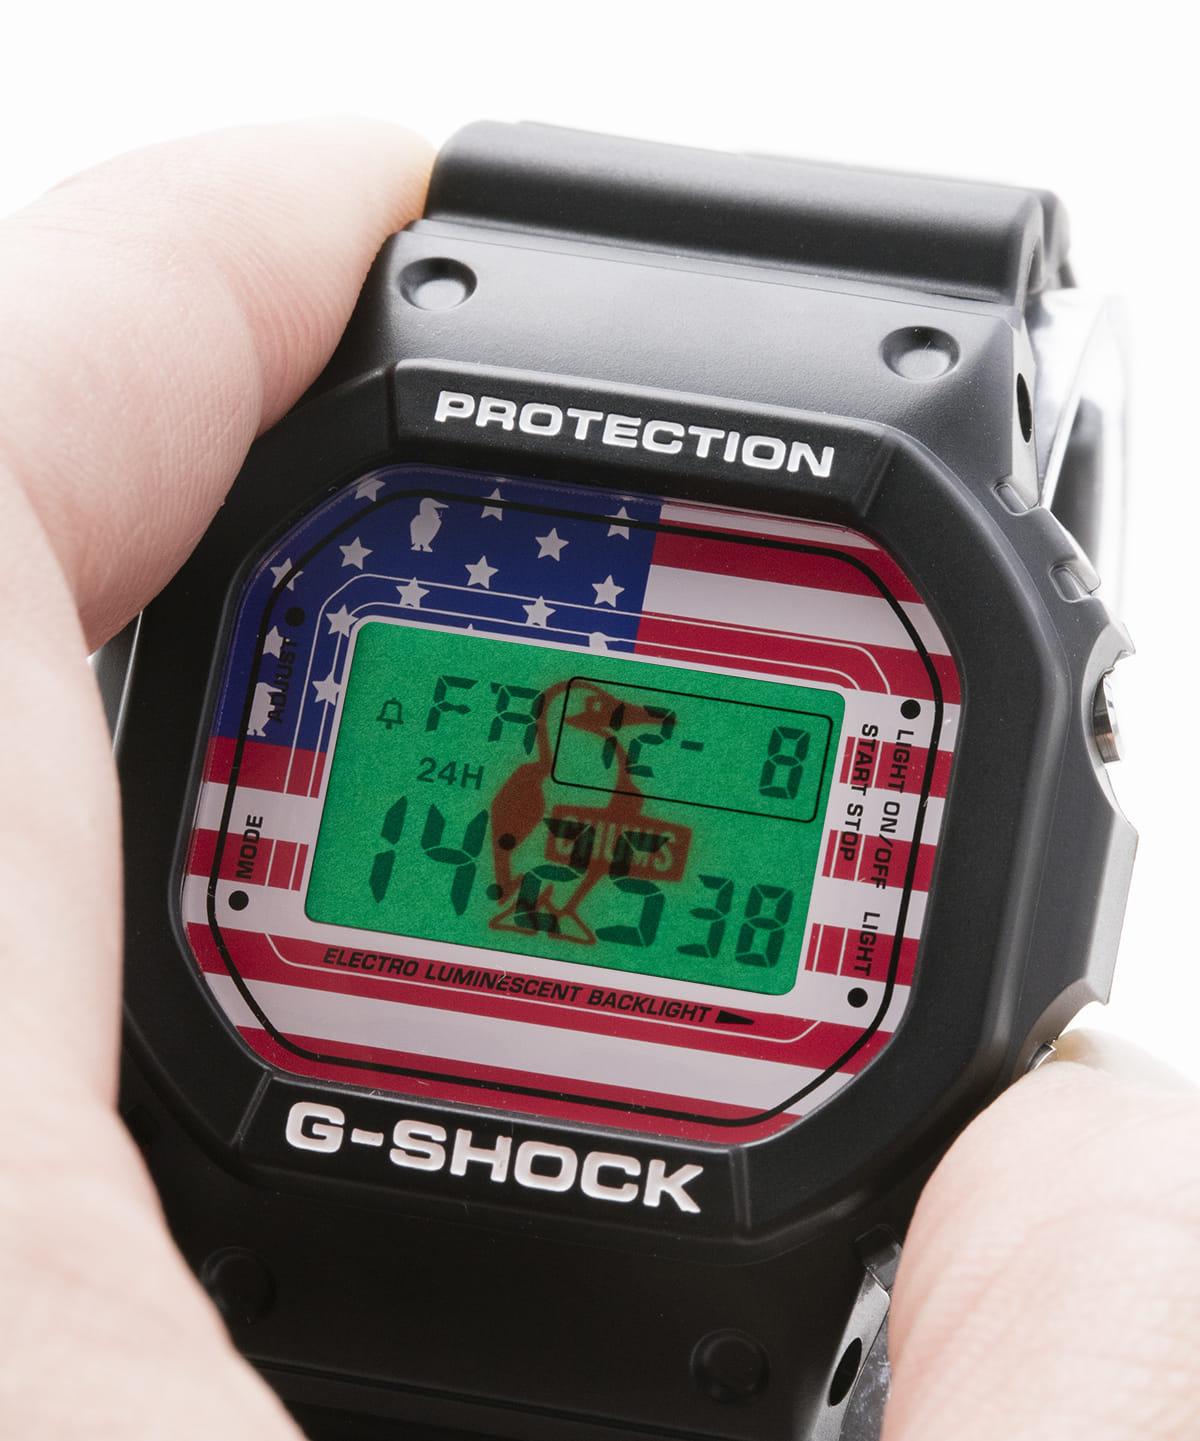 CHUMS×G-SHOCK!ともに35周年を迎えた両ブランドのコラボウォッチが登場! technology180316_chums-gshock_8-1200x1441